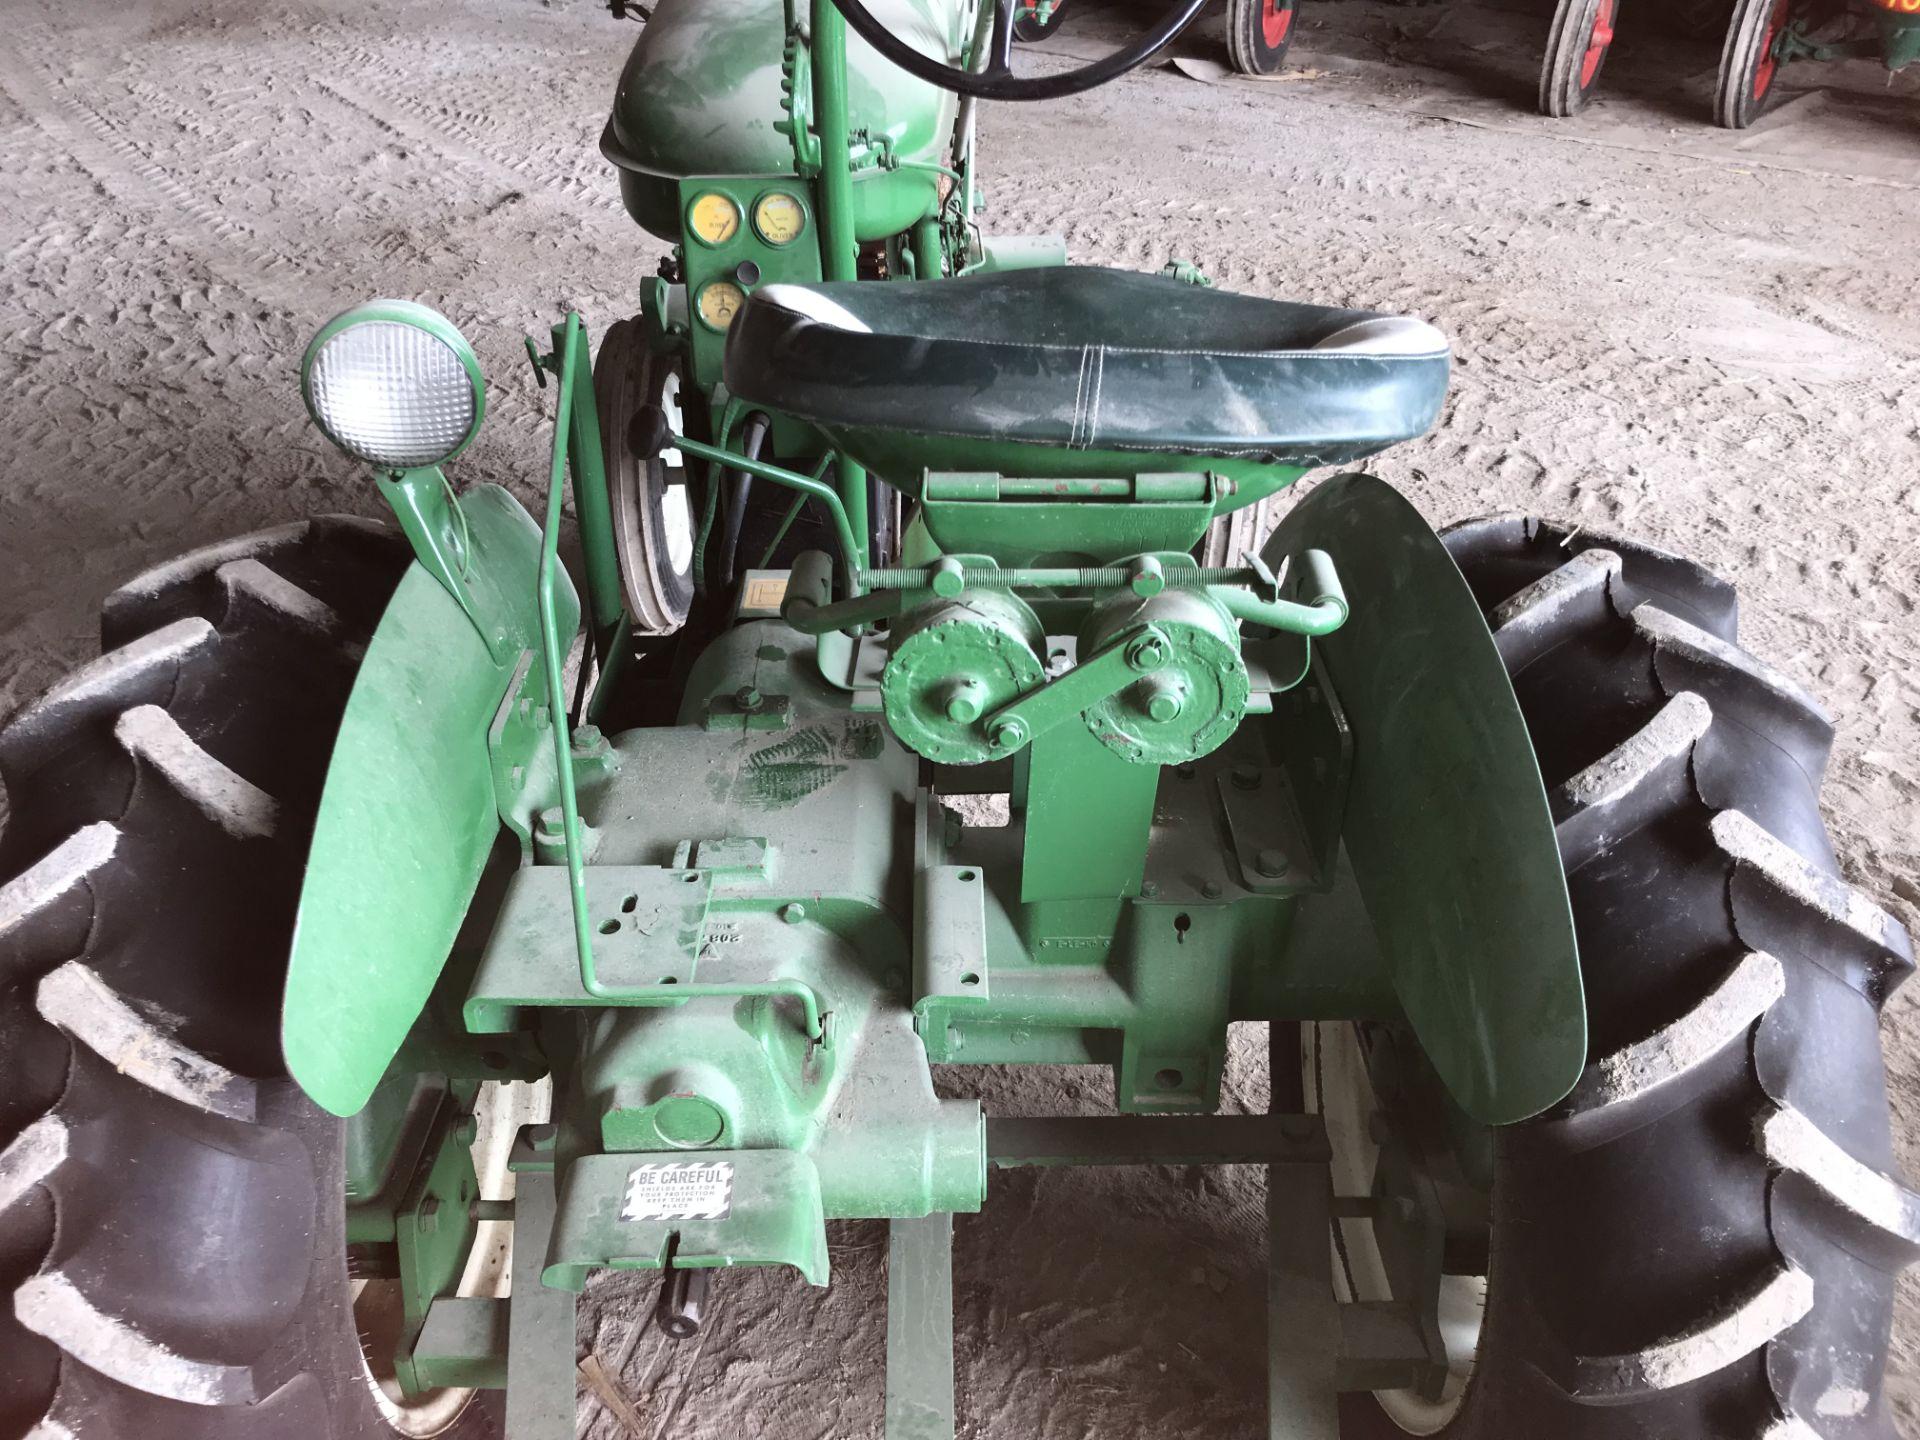 Lot 14 - Mdl.440 S#F140-497, 12.2x24 New Rubber (restored)